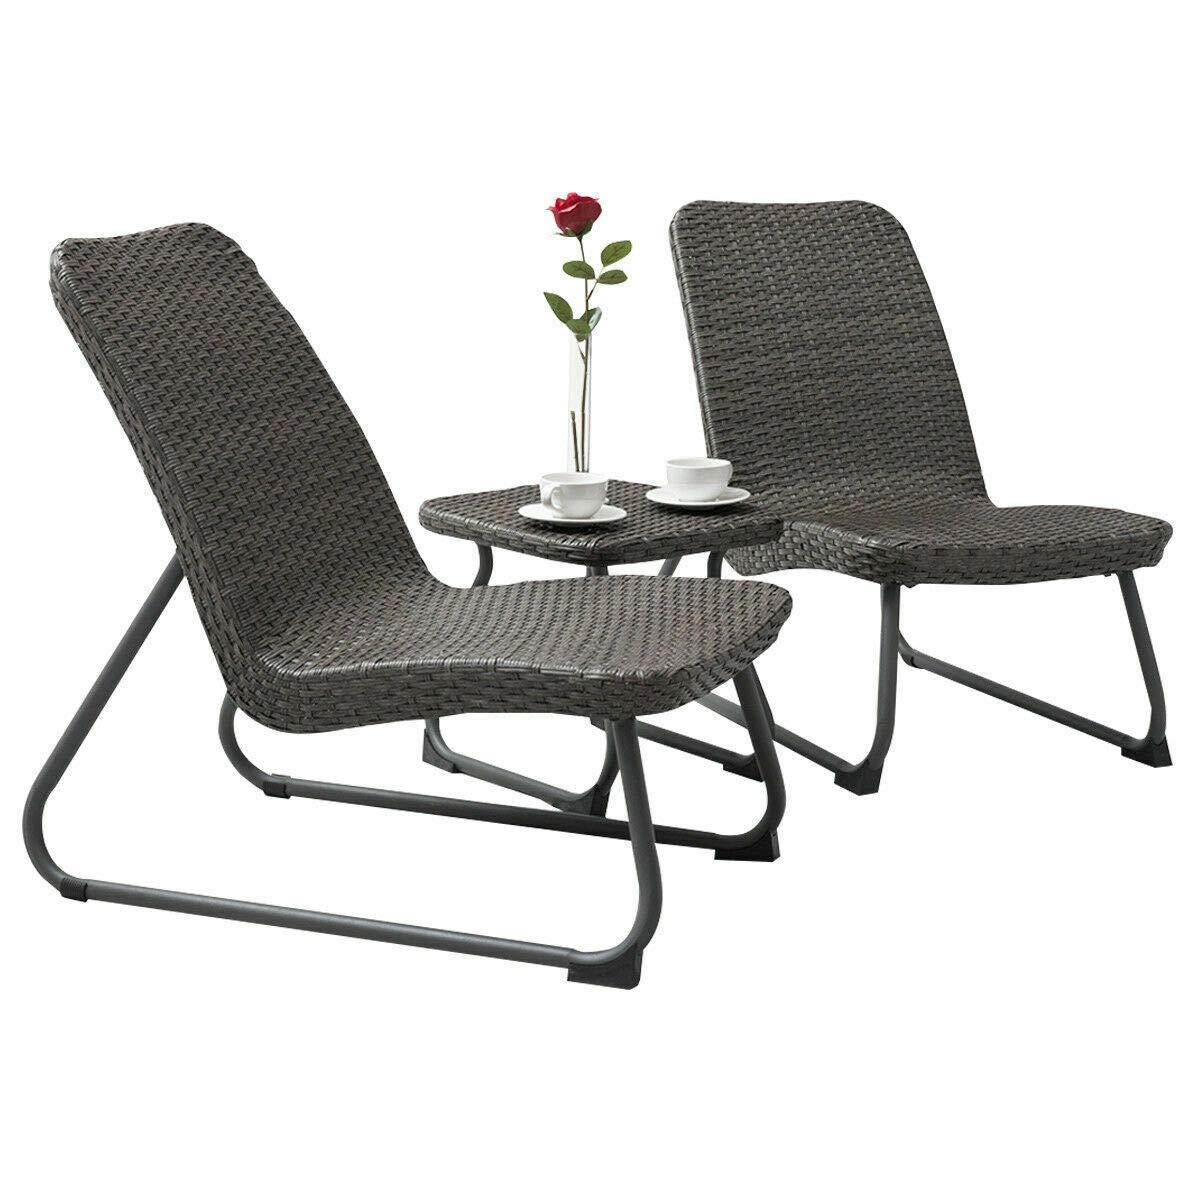 Antik shop Outdoor 3 Piece All Weather Patio Garden Conversation Chair & Table Set Gray by Antik shop